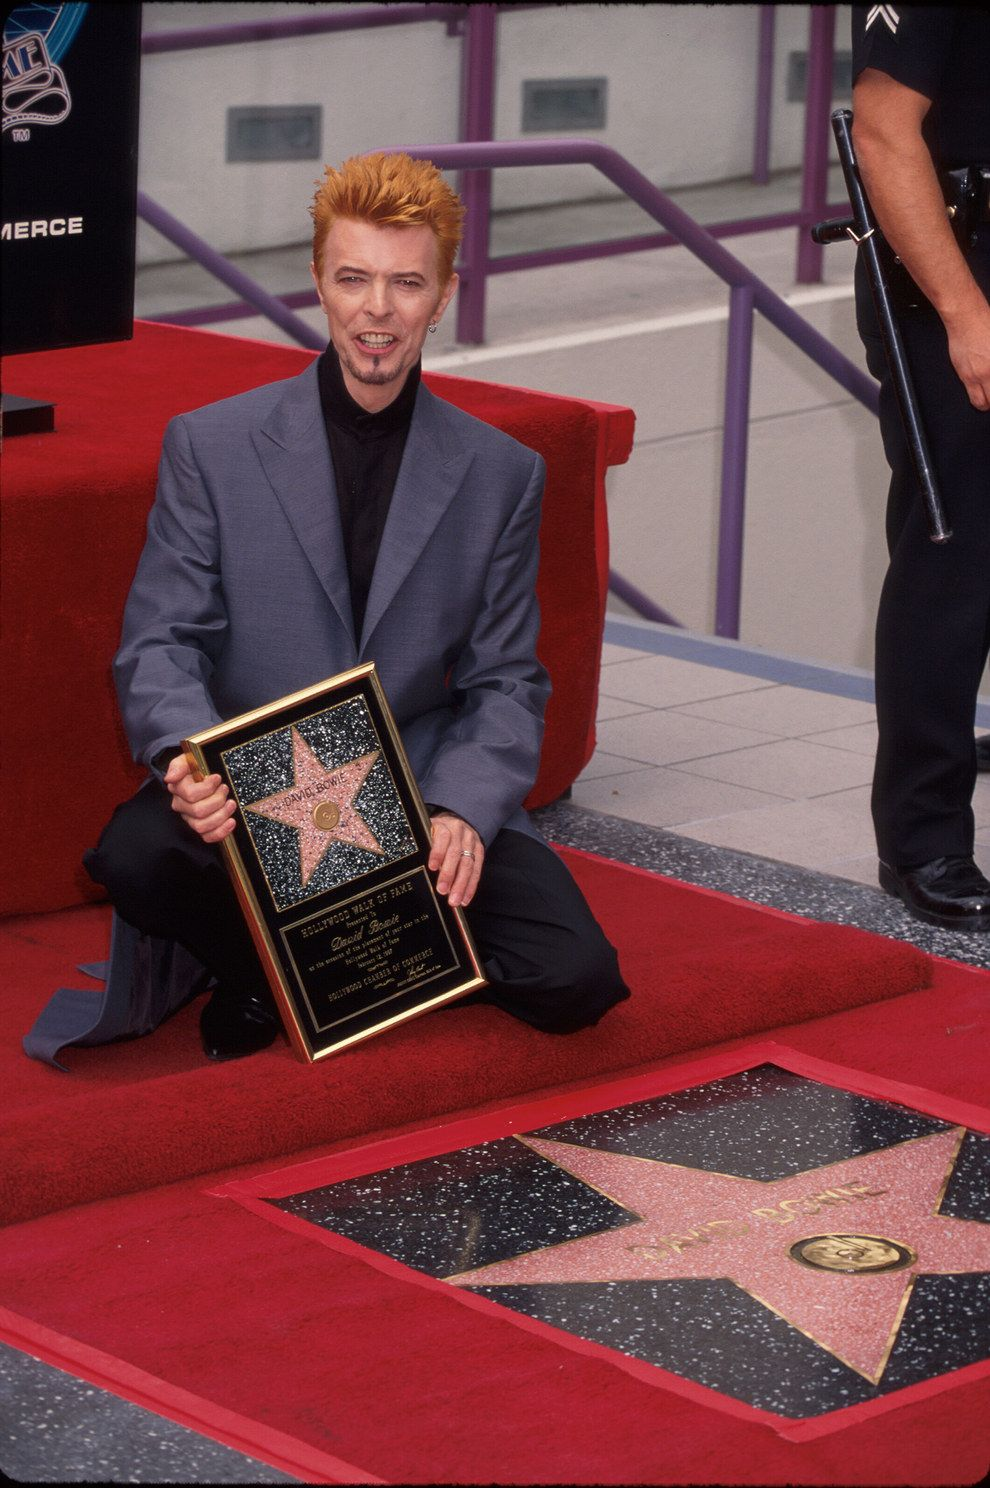 Hagamos TOP a David Bowie [Gigapost] | Bowie | Pinterest ...